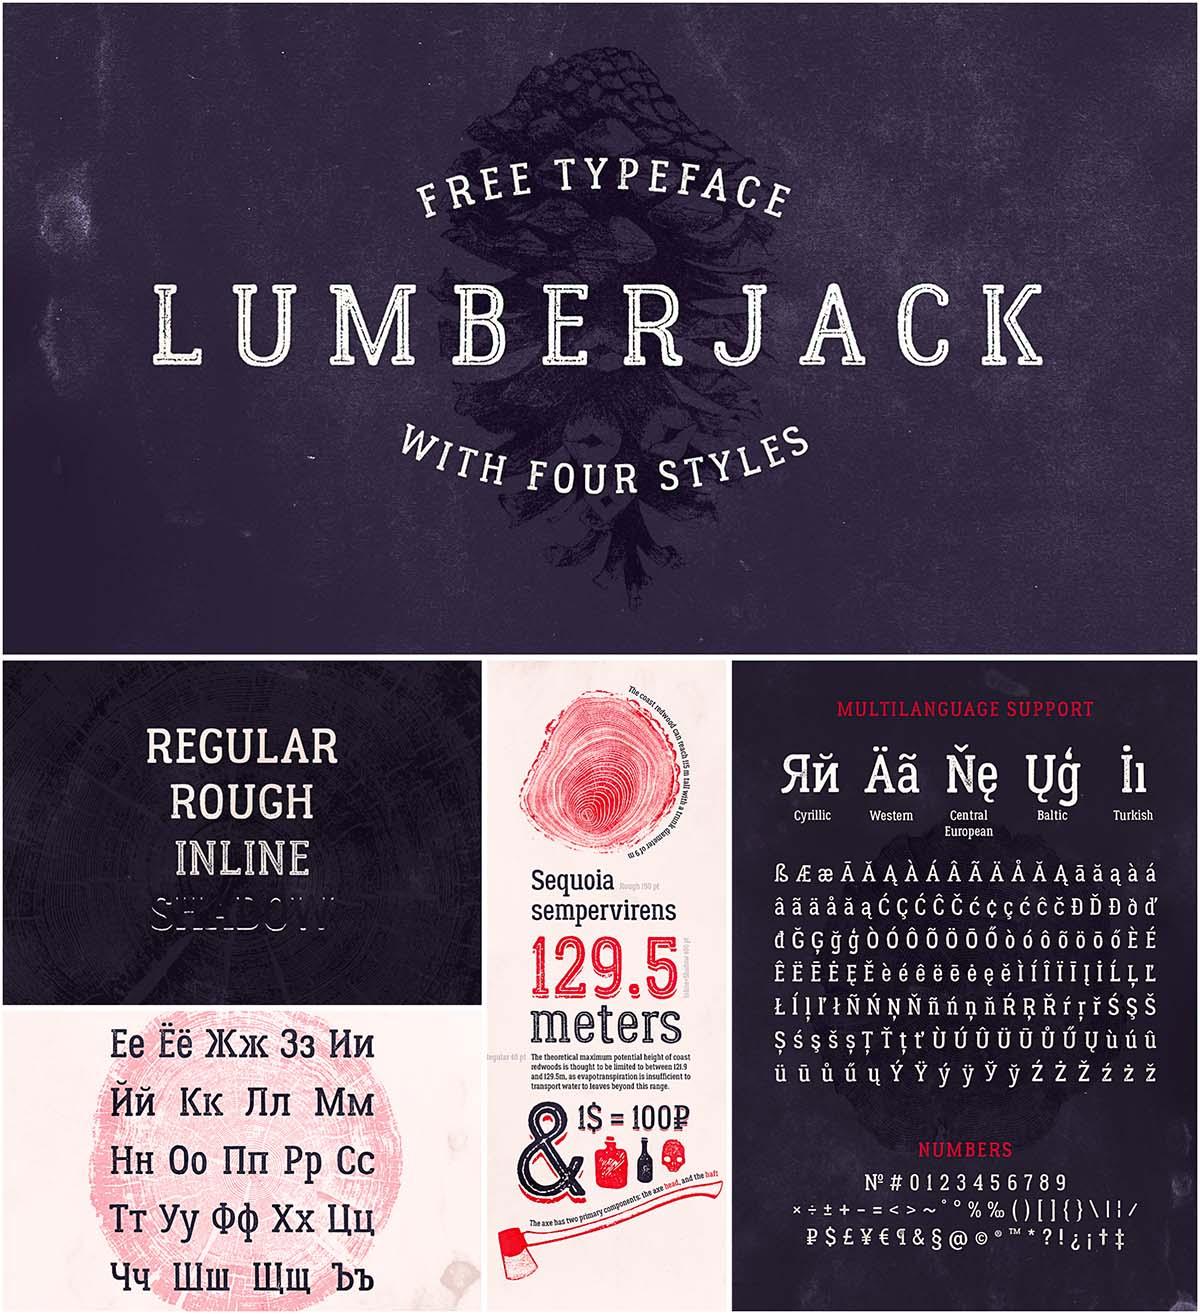 Lumberjack cyrillic font